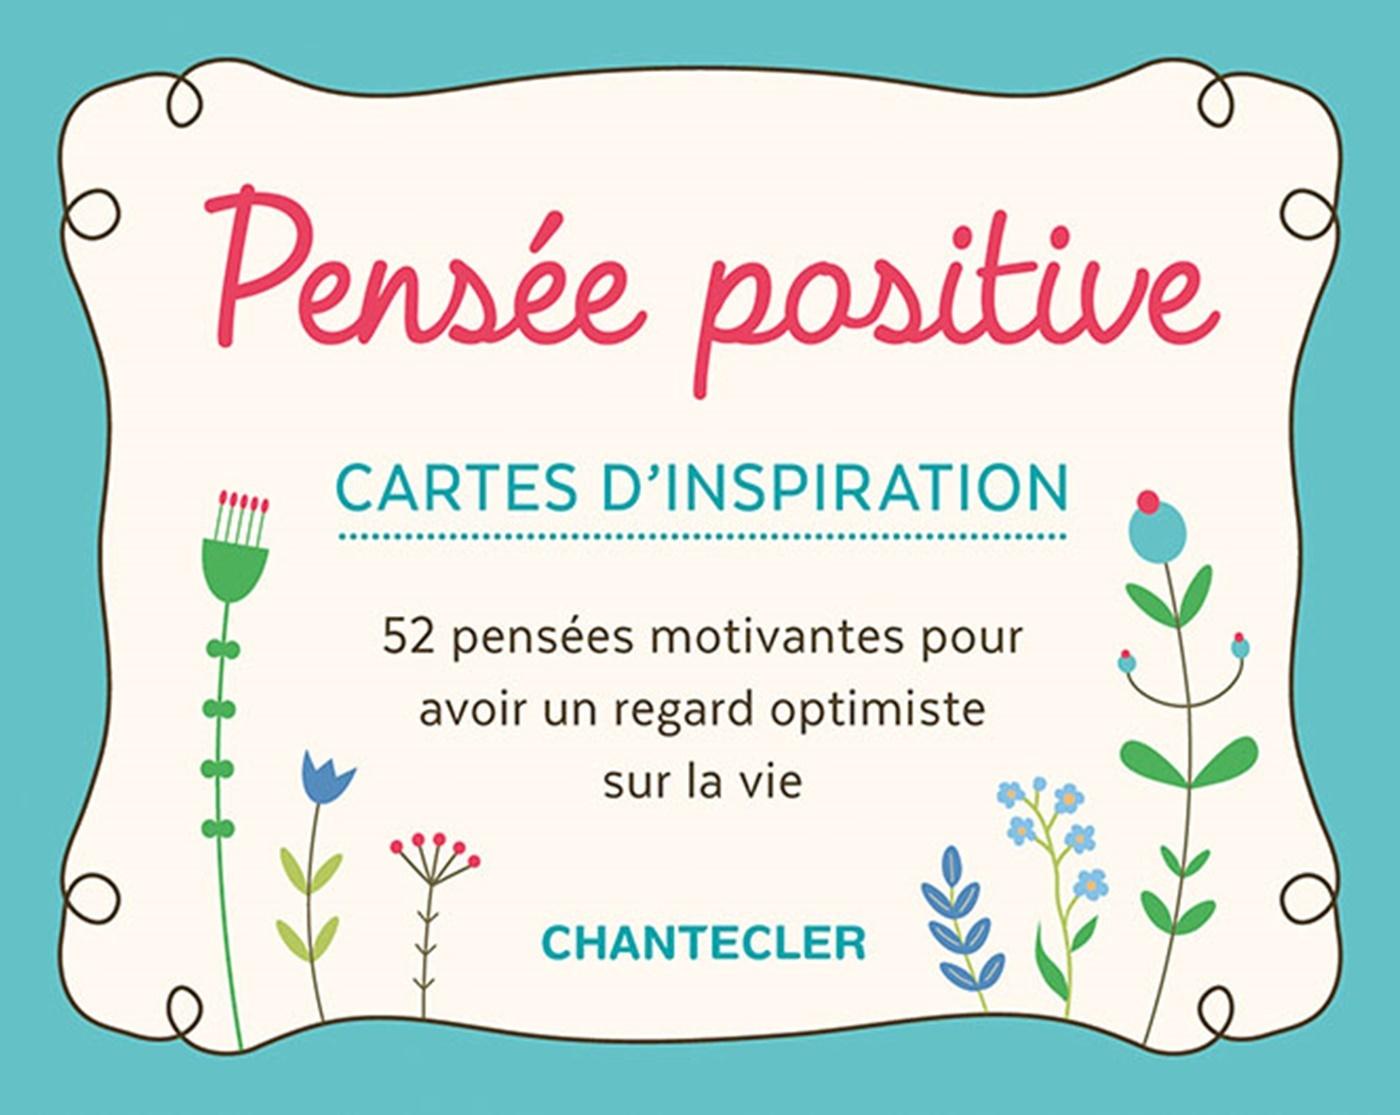 PENSEE POSITIVE - CARTES D'INSPIRATION